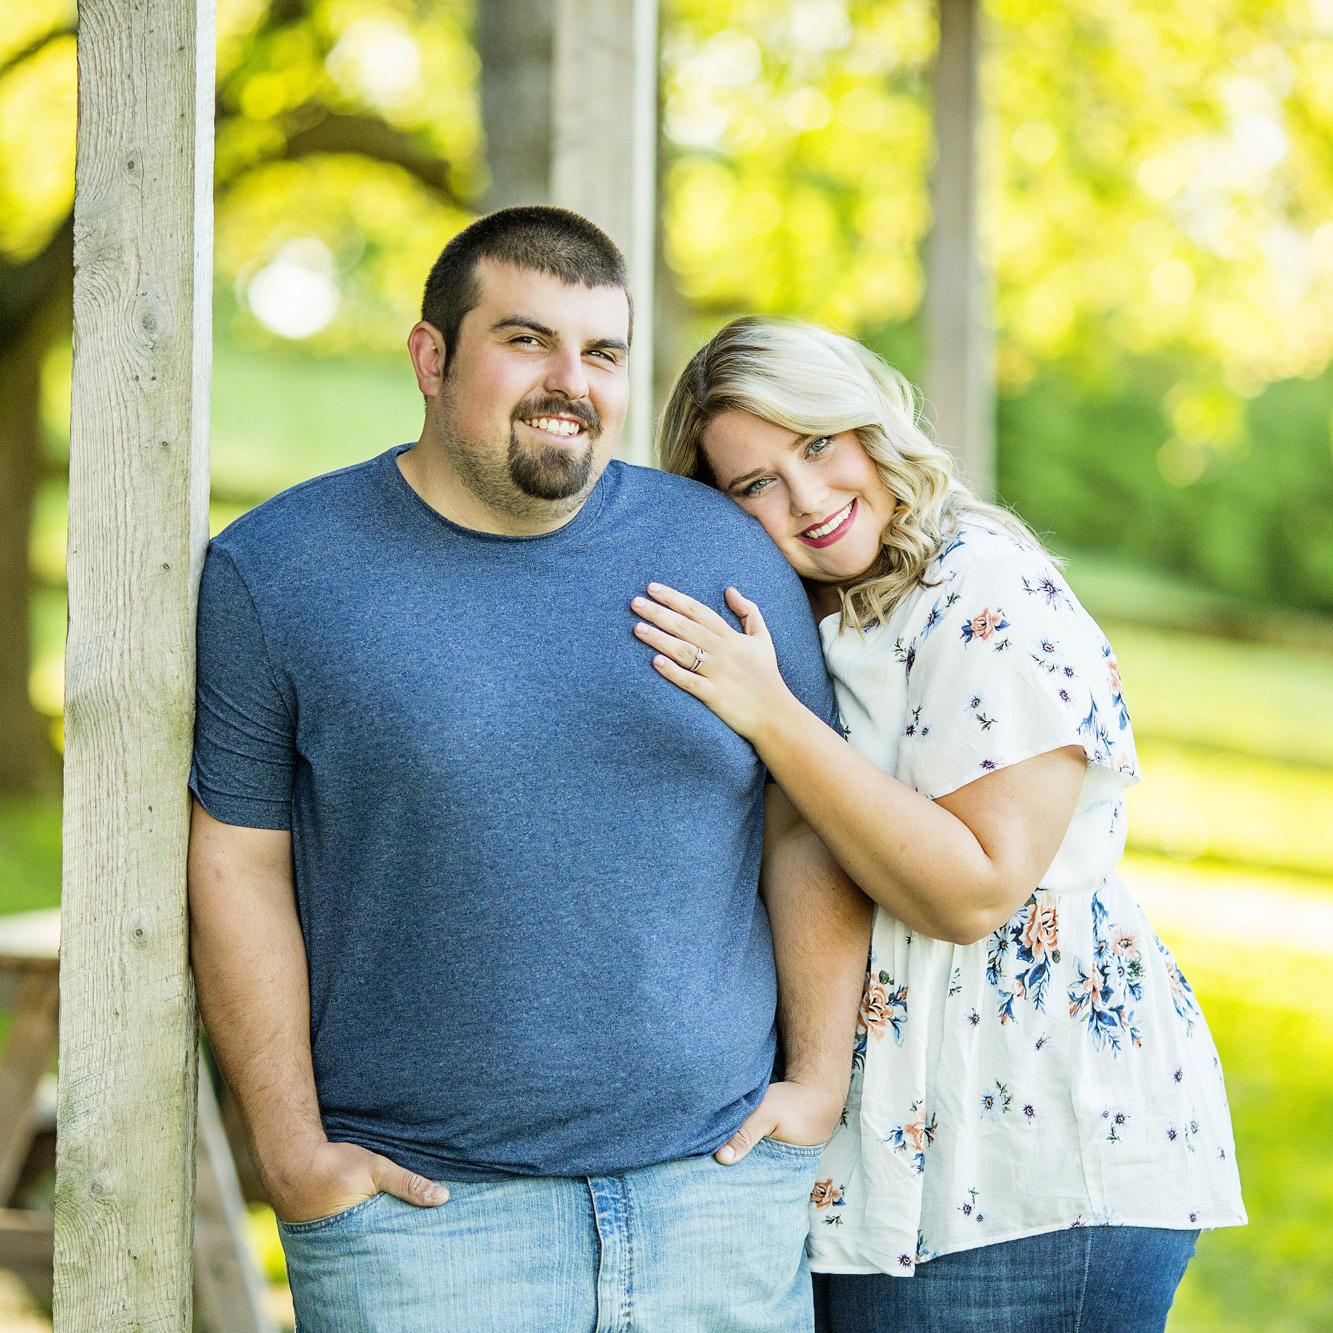 Seriously_Sabrina_Photography_Lexington_Kentucky_Sunset_Farm_Engagement_Cody_Sara_11.jpg